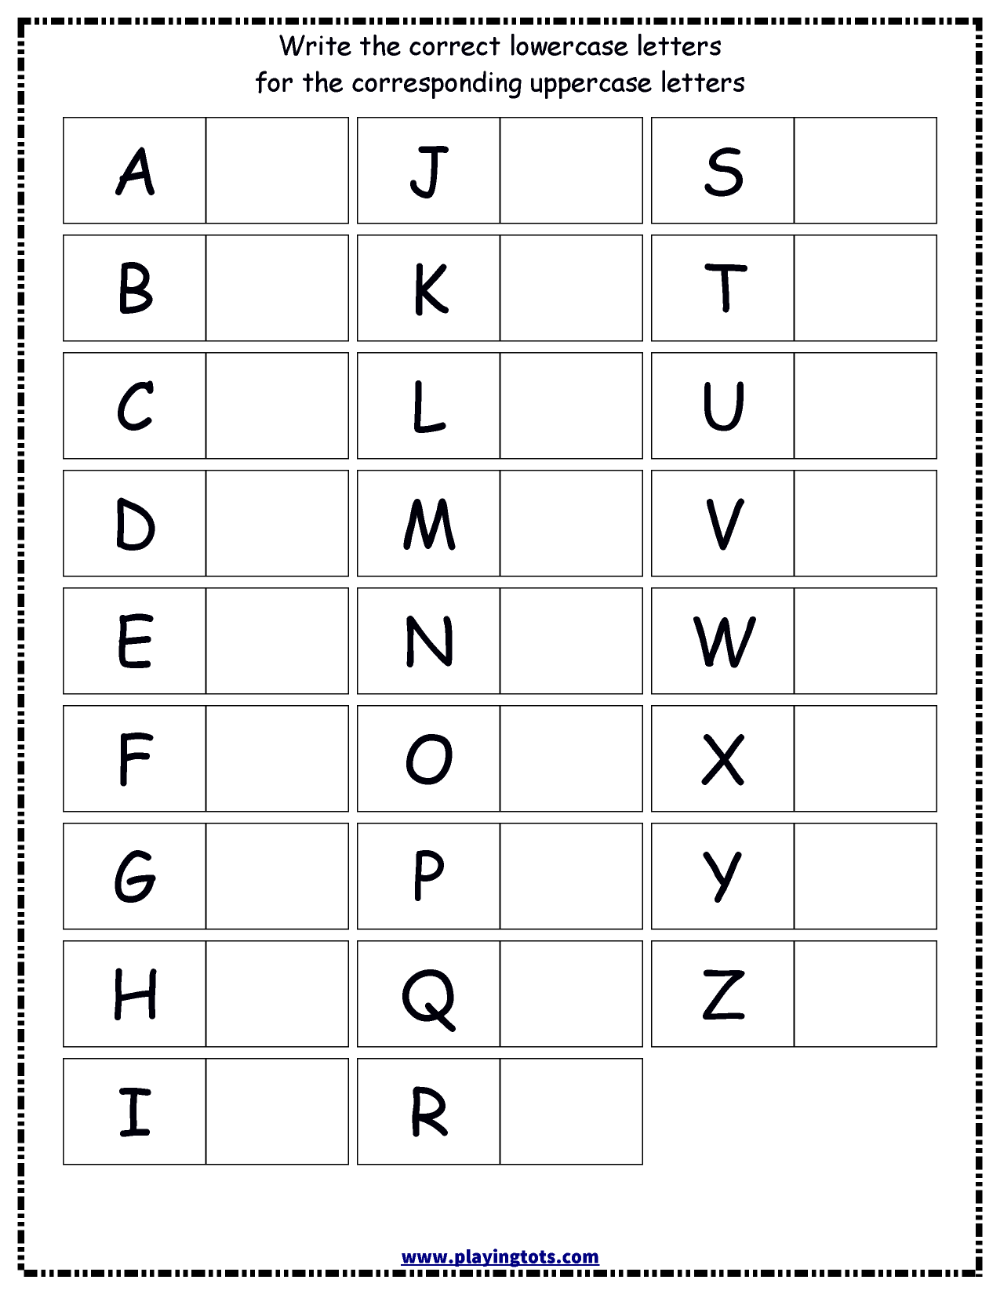 Pin On Worksheets within Alphabet Worksheets For Lkg